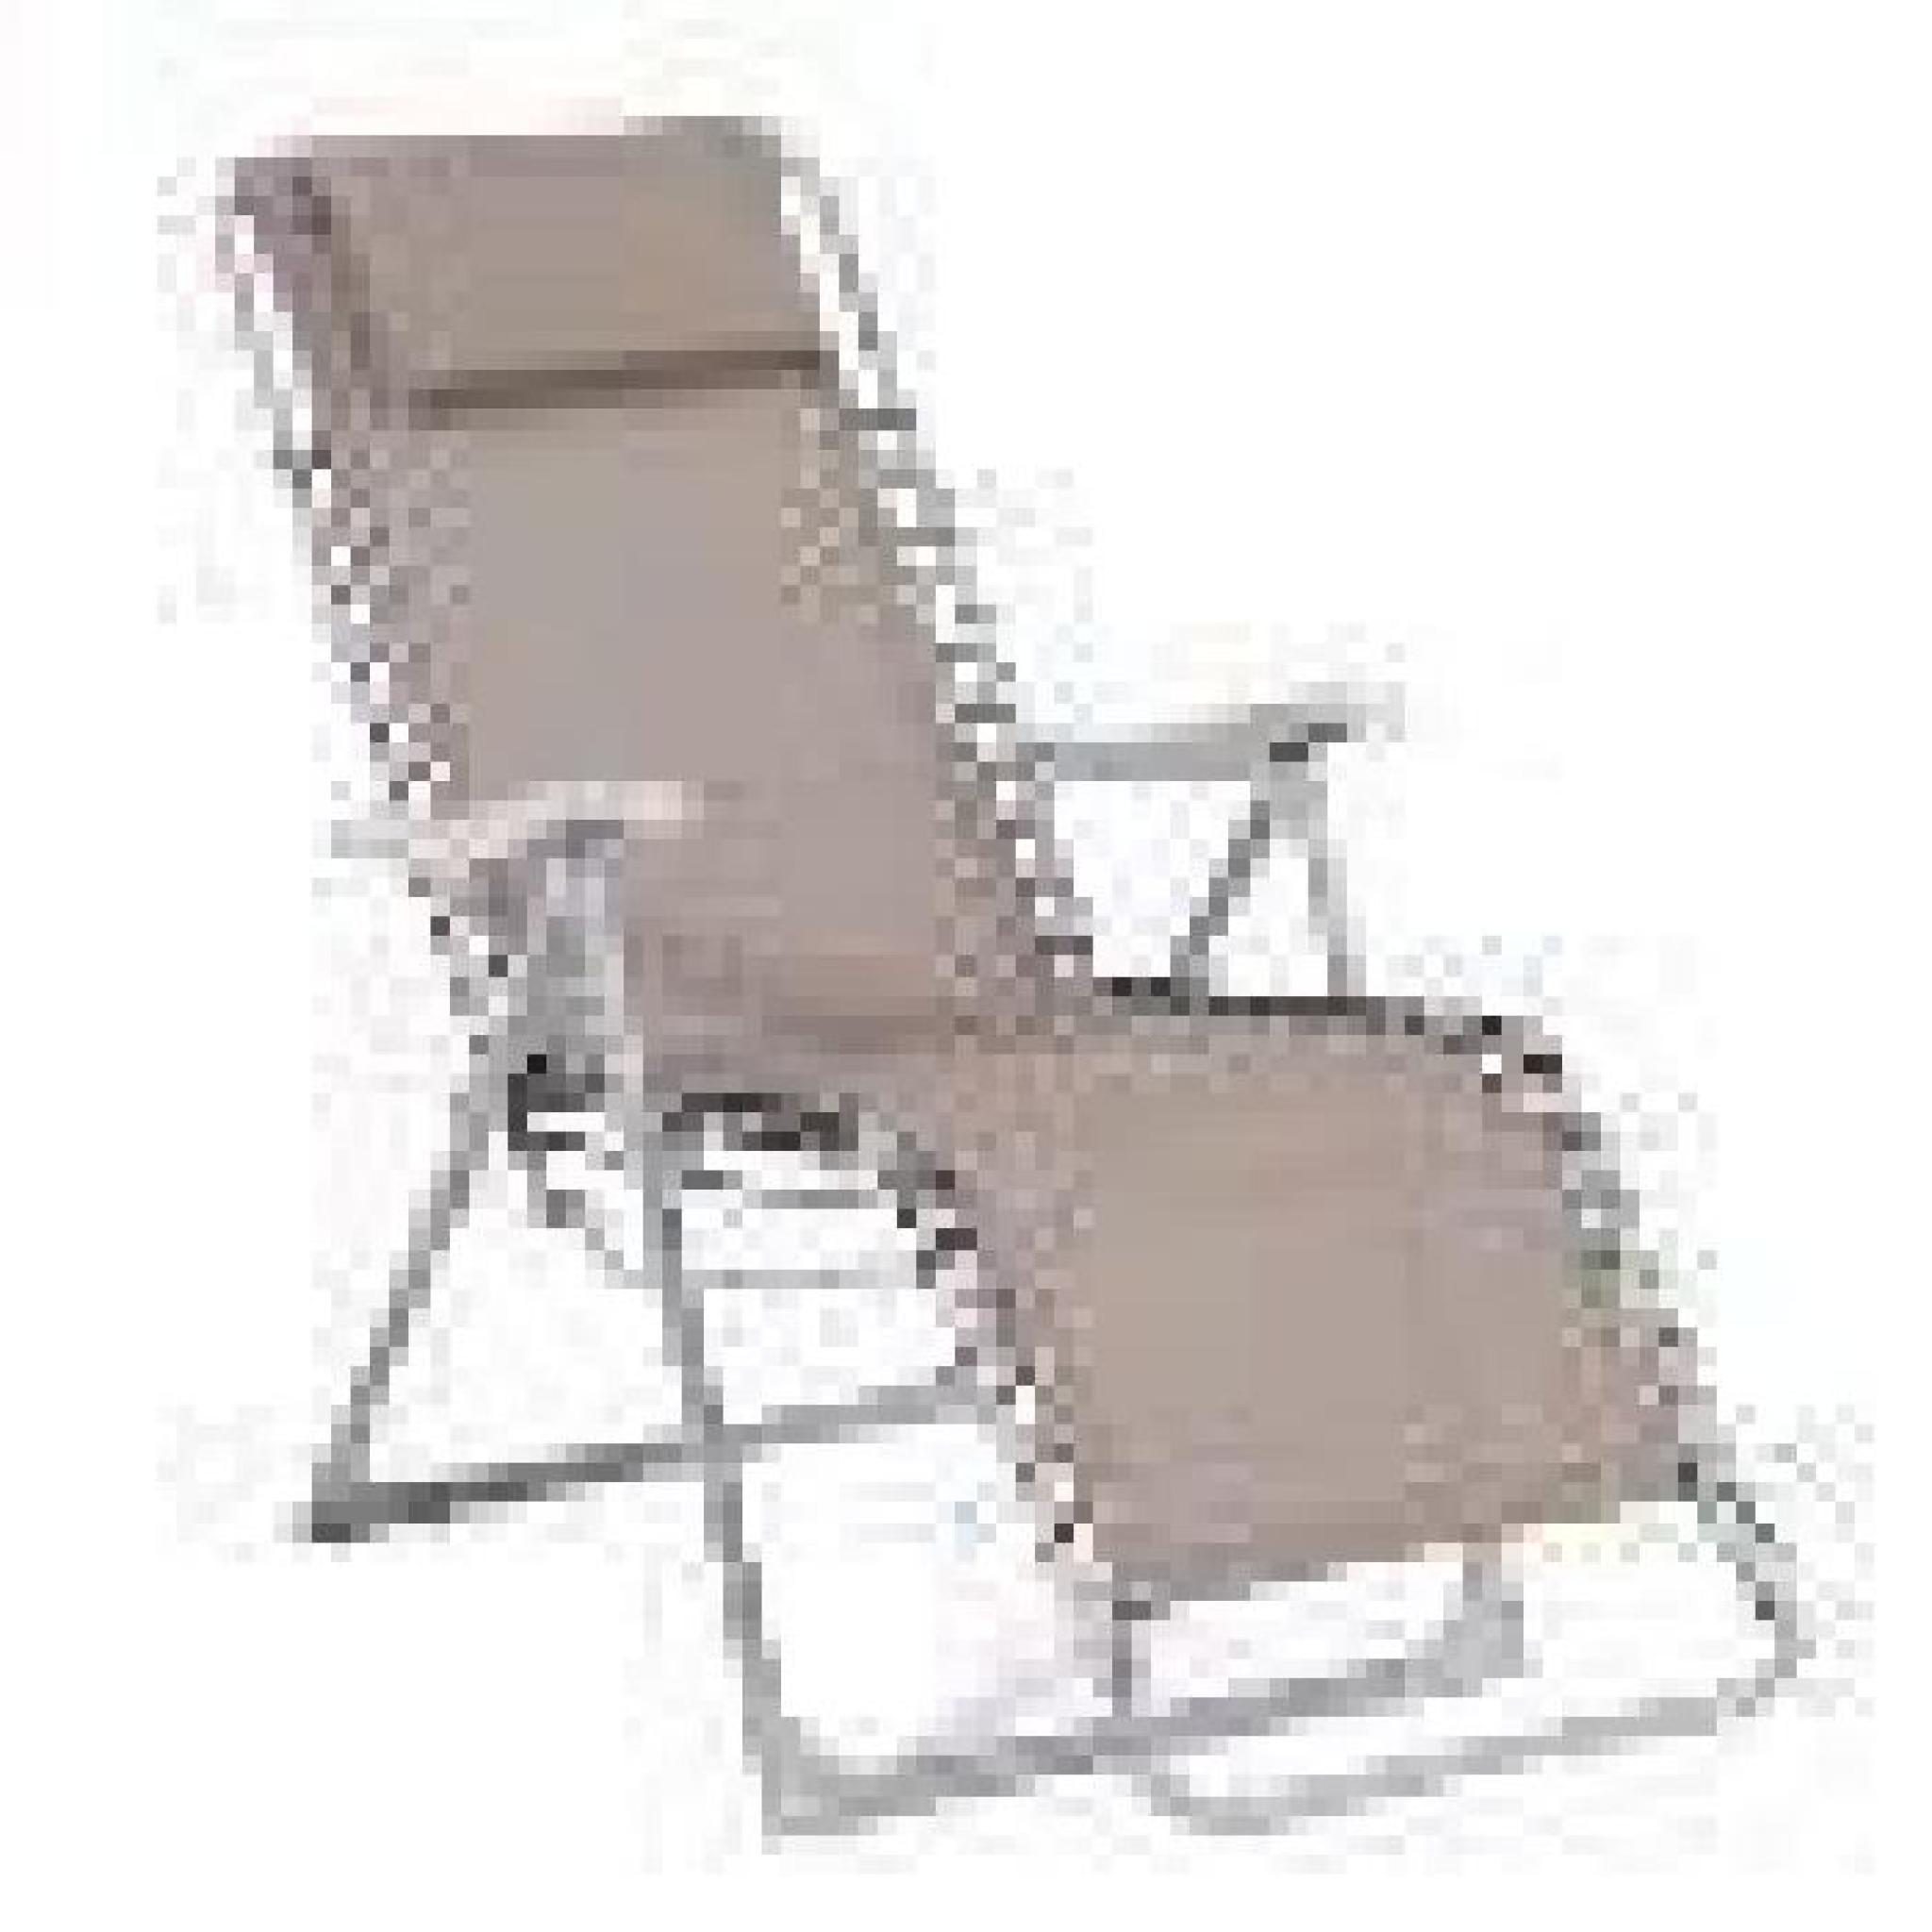 fauteuil relax siesta taupe achat vente fauteuil de. Black Bedroom Furniture Sets. Home Design Ideas